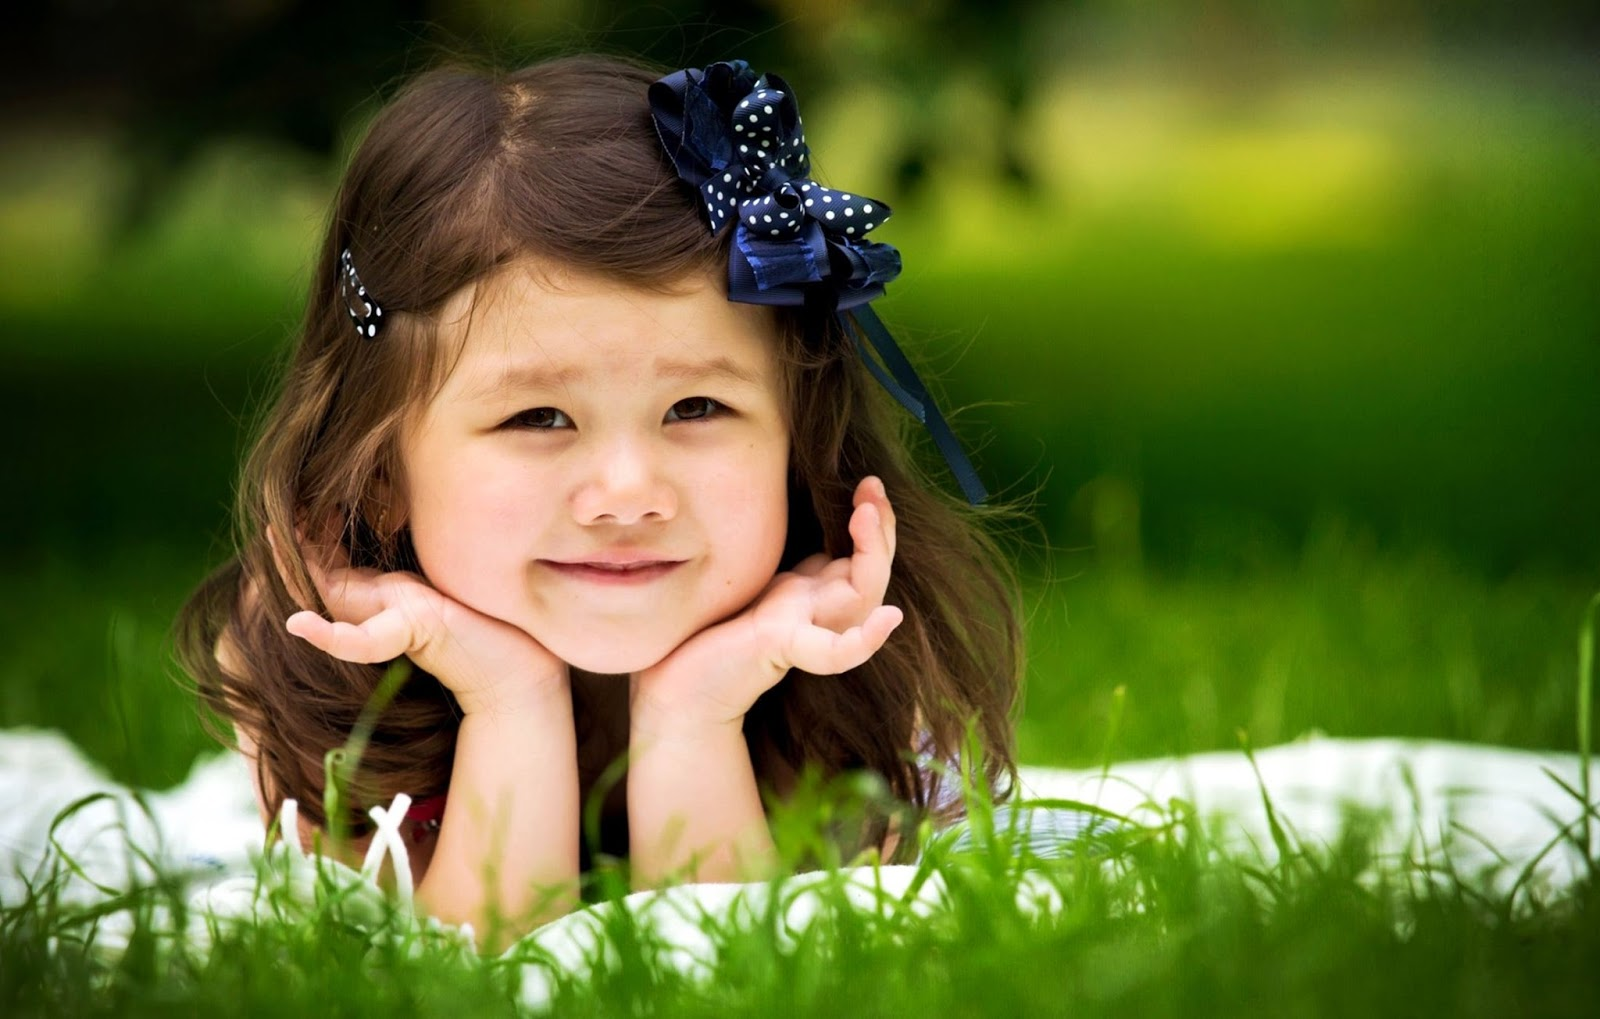 Gambar bayi perempuan cantik tersenyum gratis